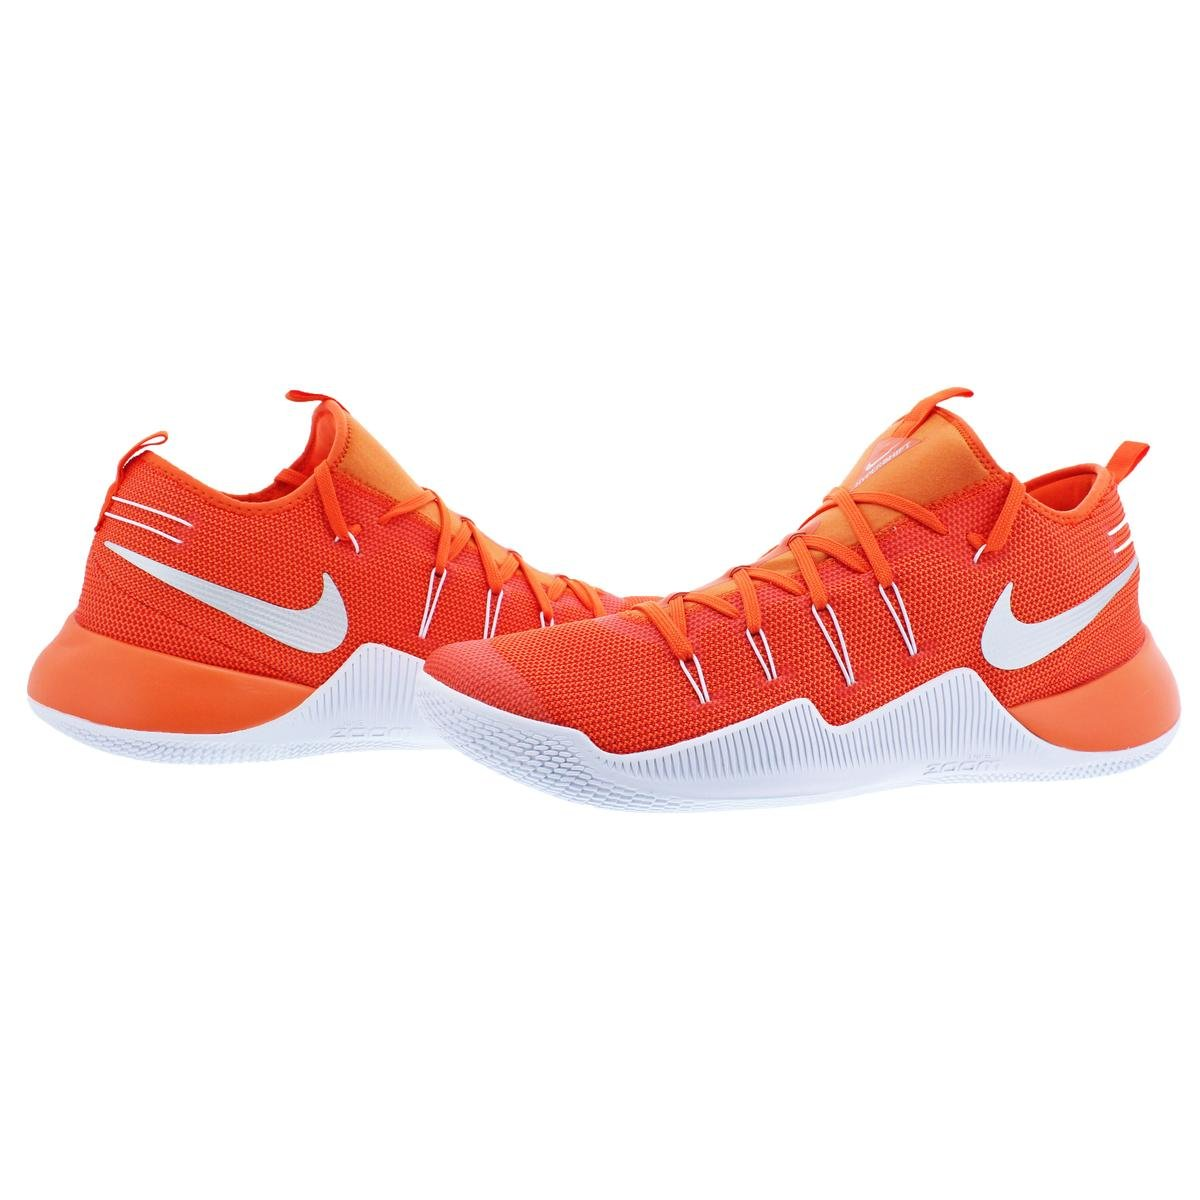 buy online 0ad97 3097e Amazon.com   Nike Hypershift TB Promo Men s Mesh Lace-Up Basketball Shoes  Orange Size 18   Basketball